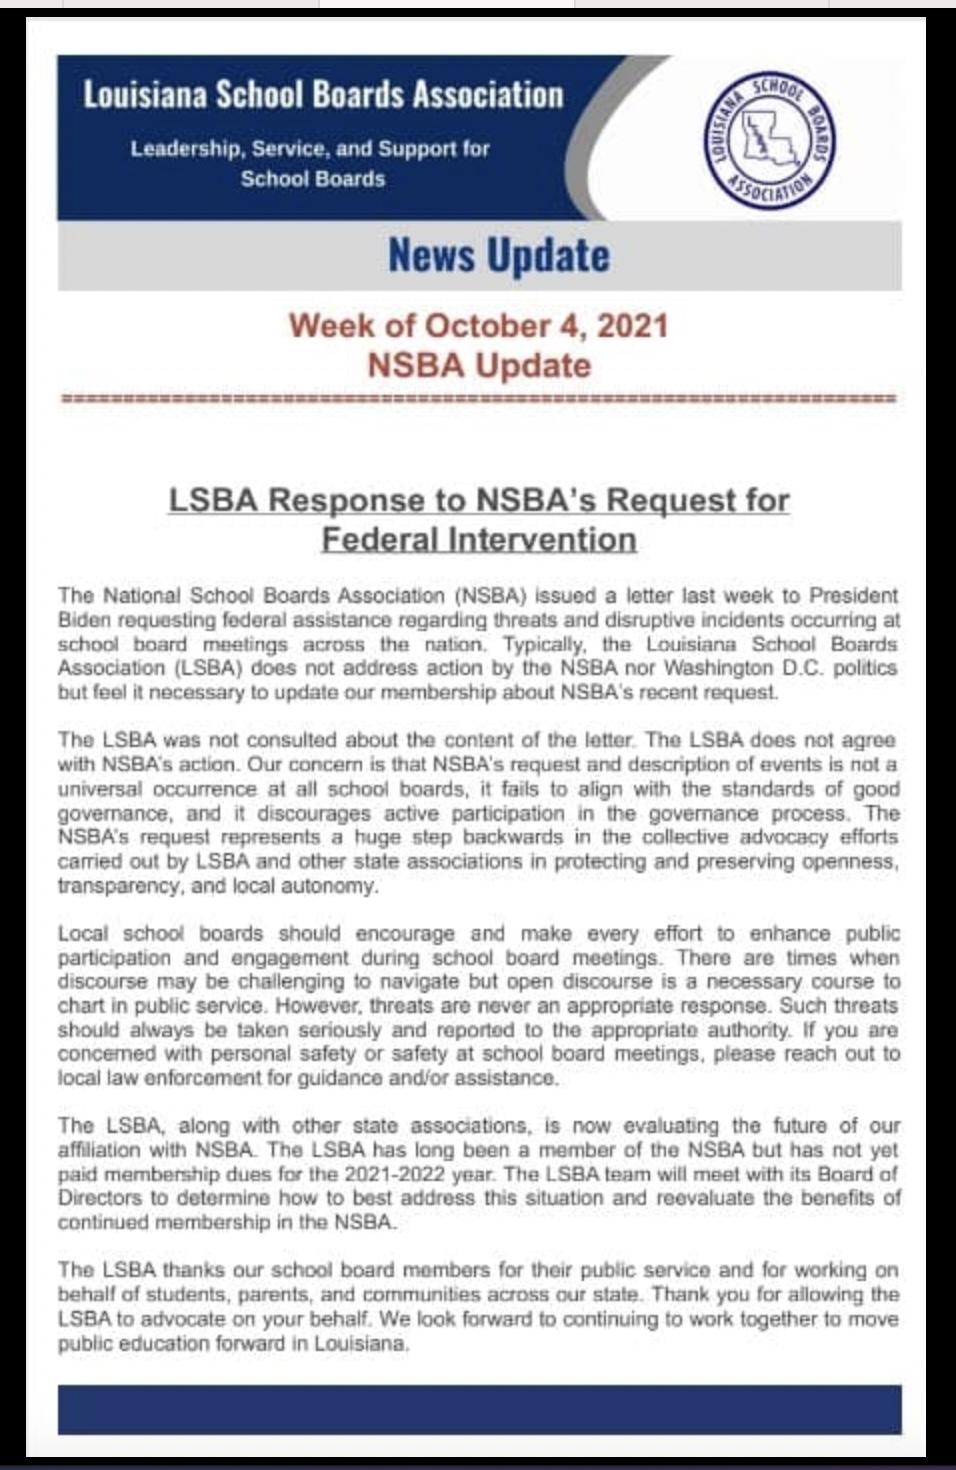 Louisiana School Boards Association news update